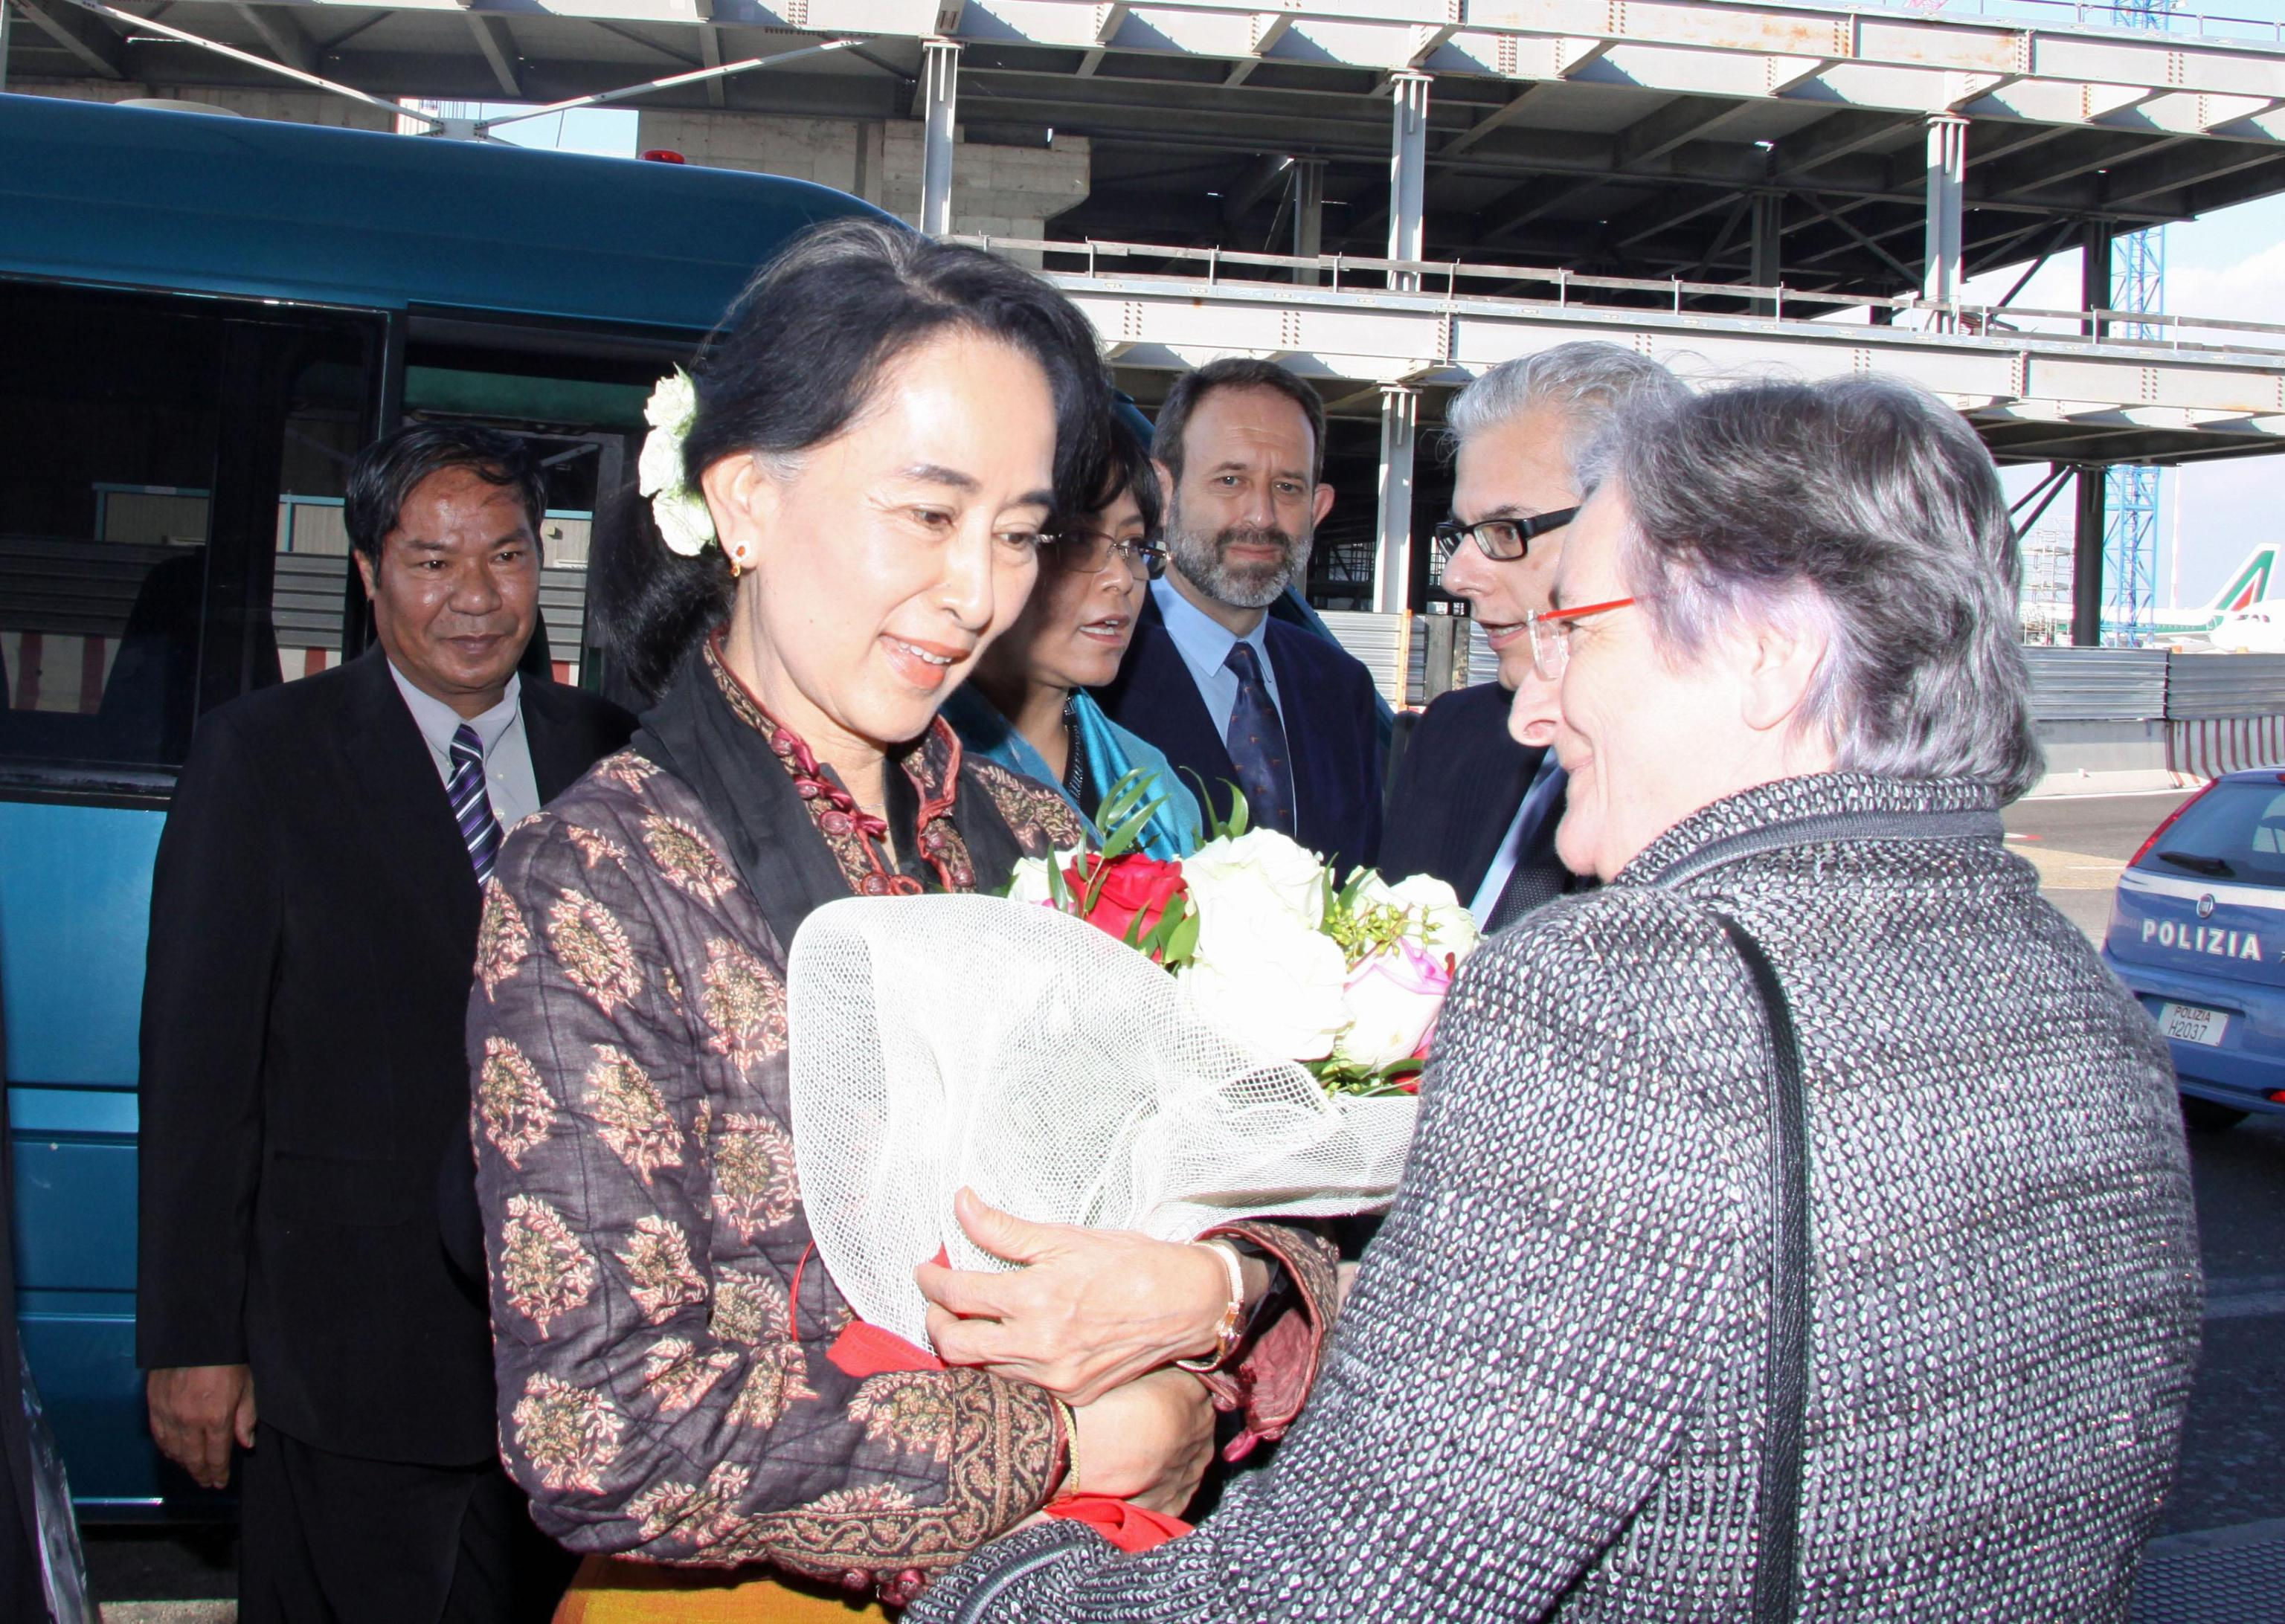 San Suu Kyi  al suo arrivo a Fiumicino (Ansa)